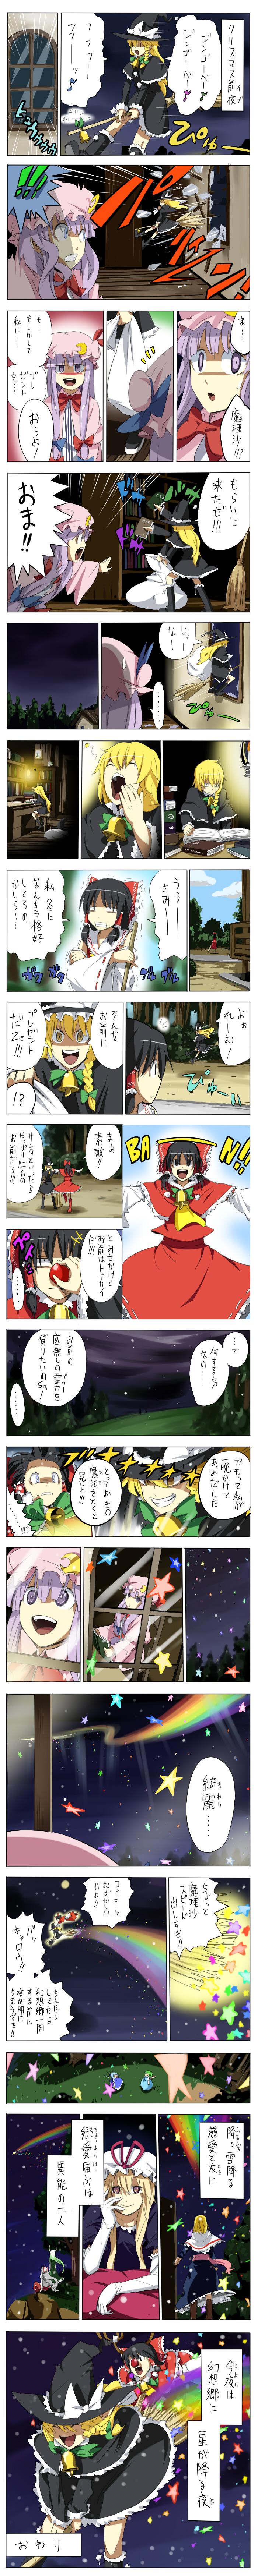 kamishirasawa keine, patchouli knowledge, fujiwara no mokou, alice margatroid, kirisame marisa, and etc (touhou) drawn by pageratta